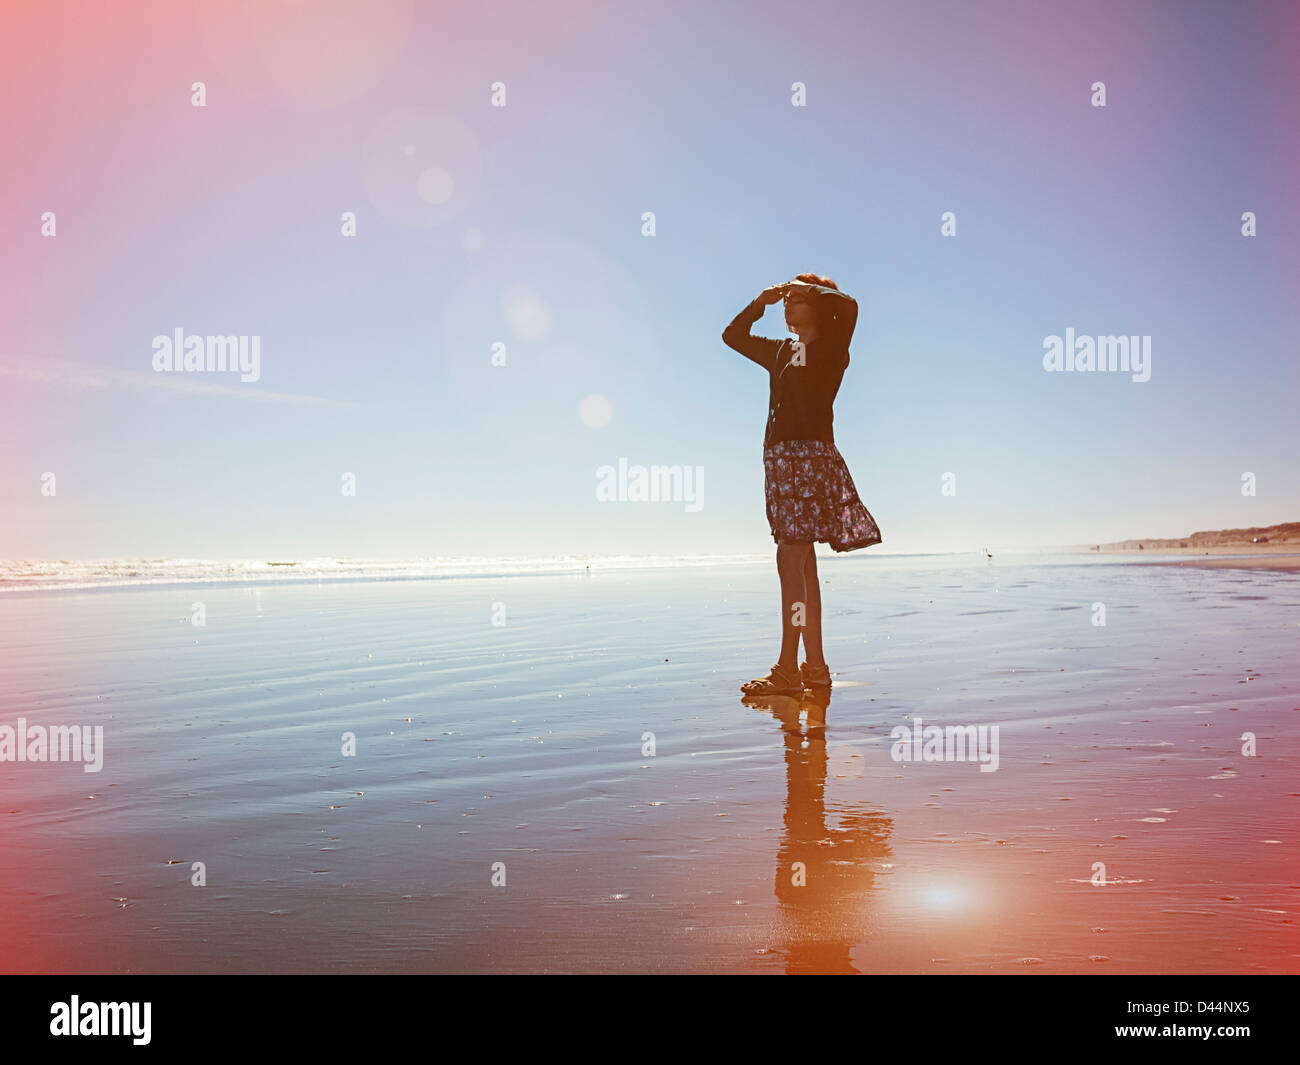 Lichtdicht, Frau blickt auf das Meer, Neuseeland. Stockbild